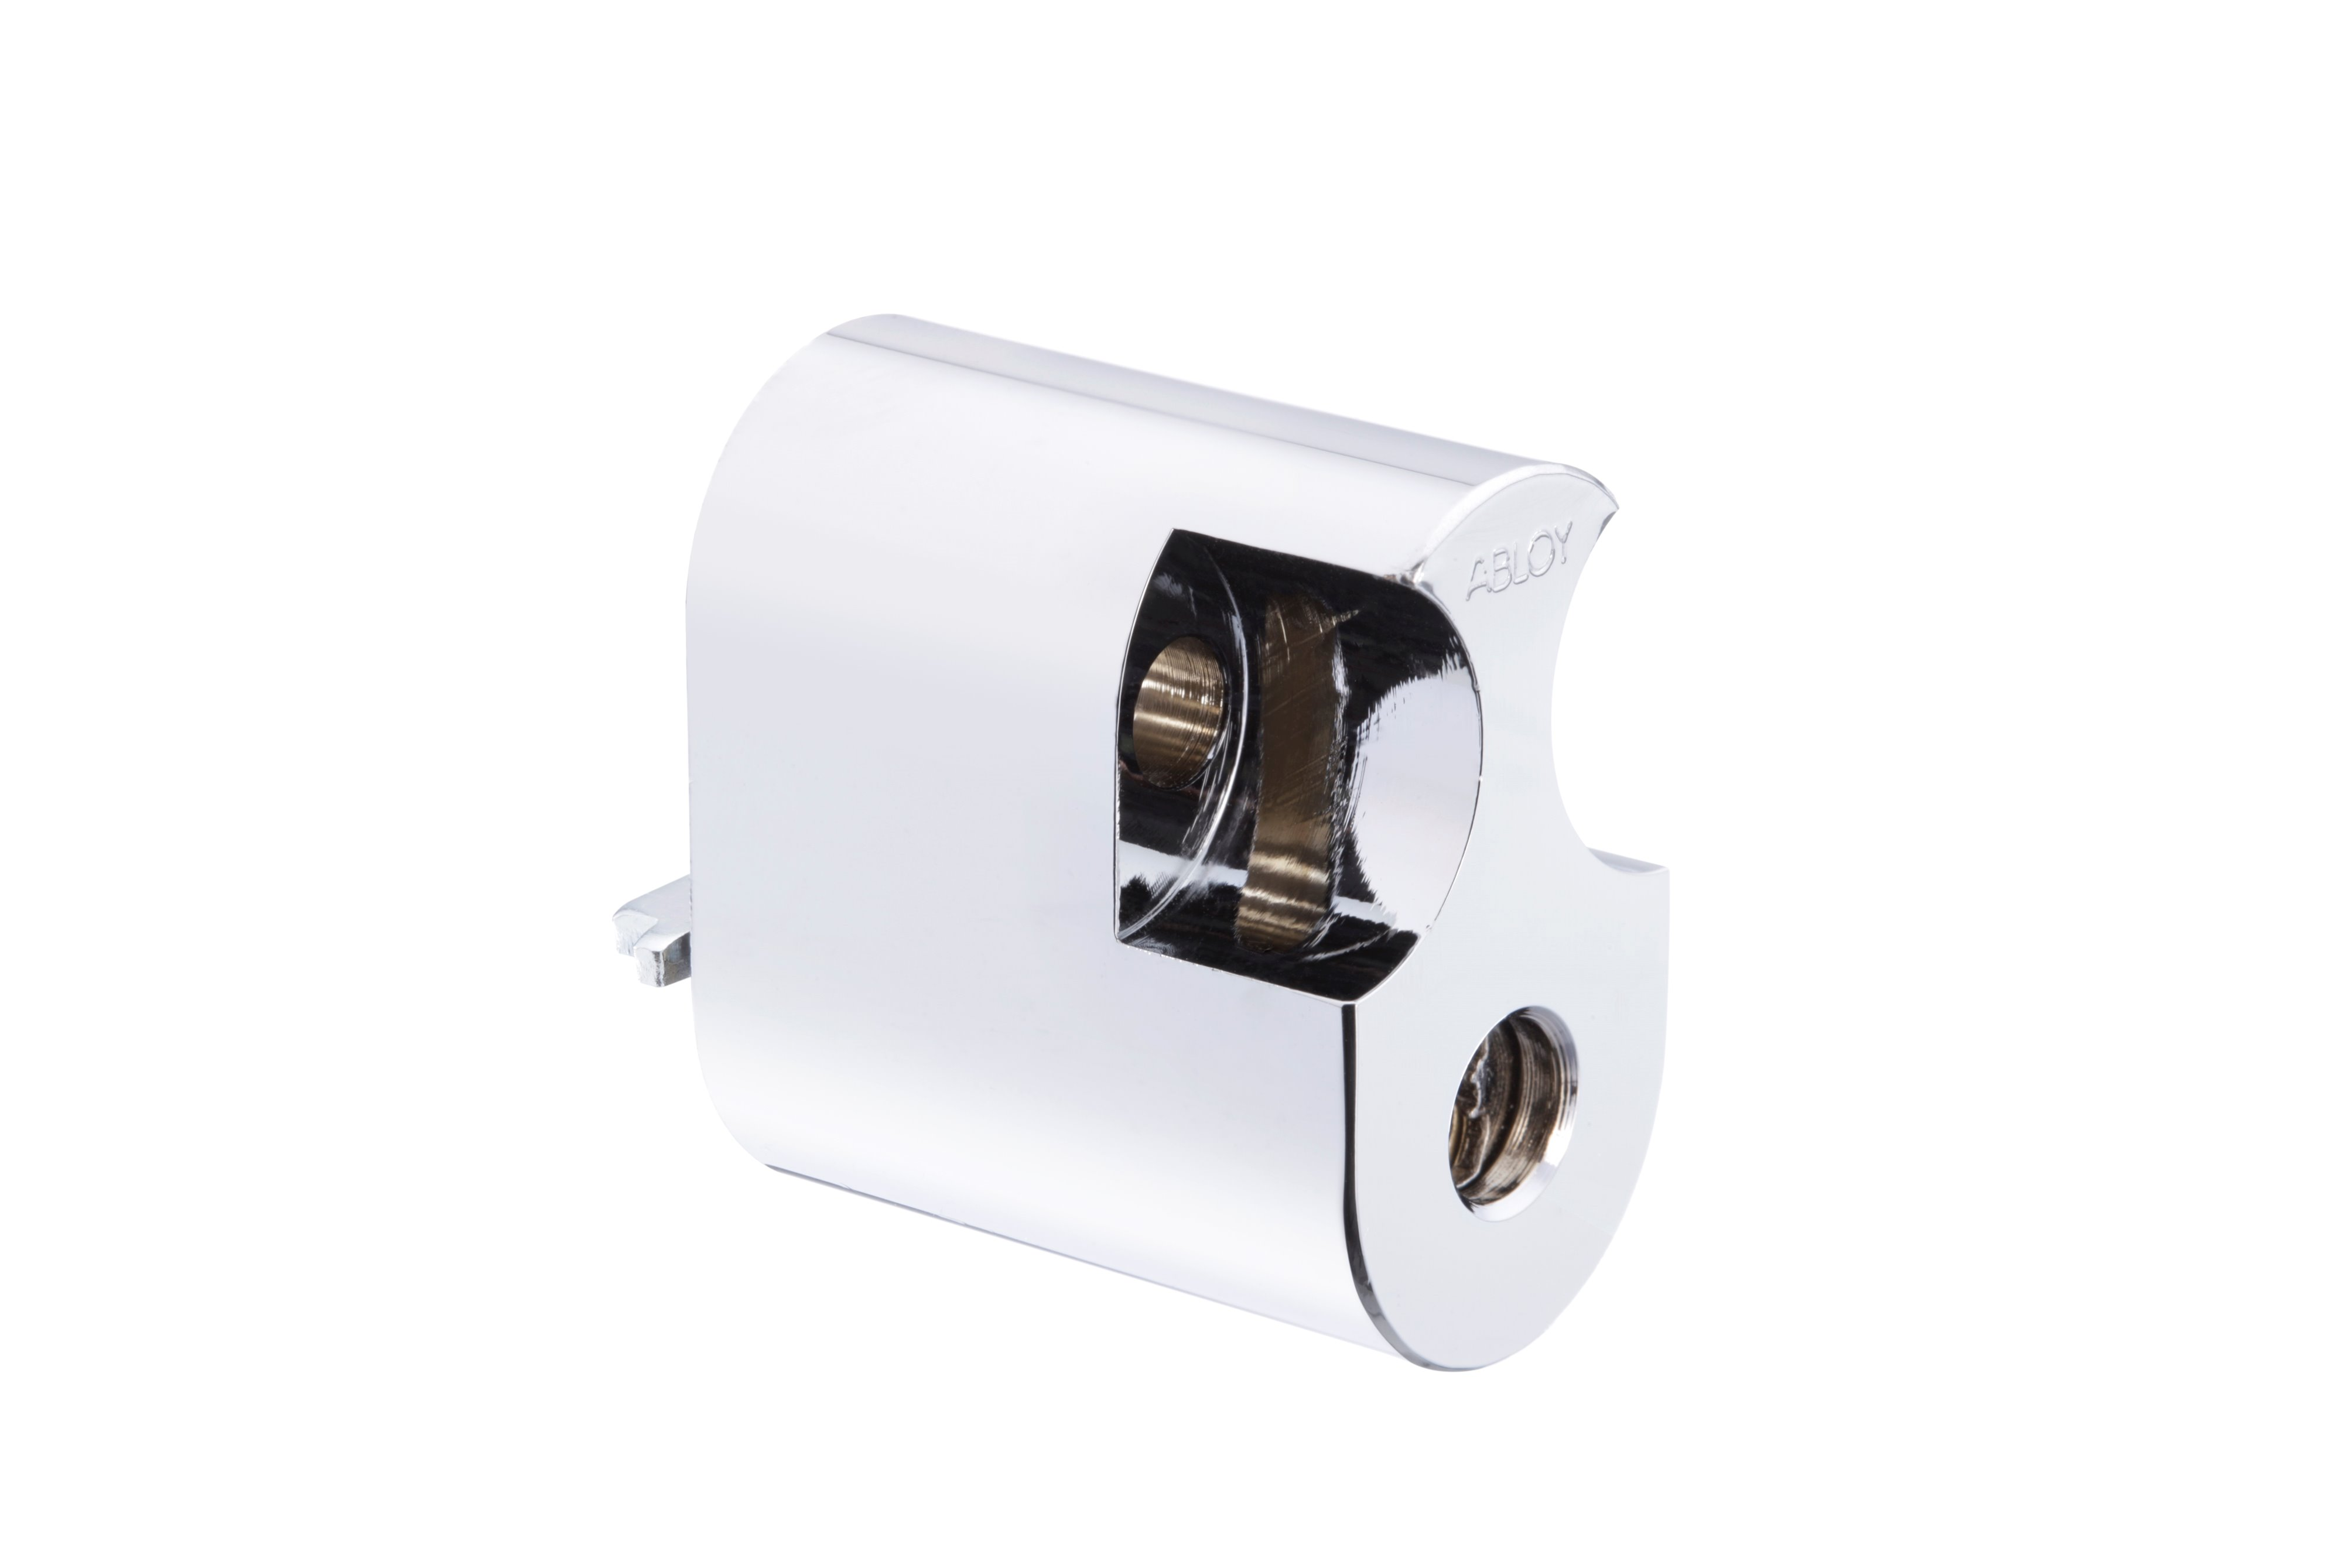 CY207 Inside oval cylinder